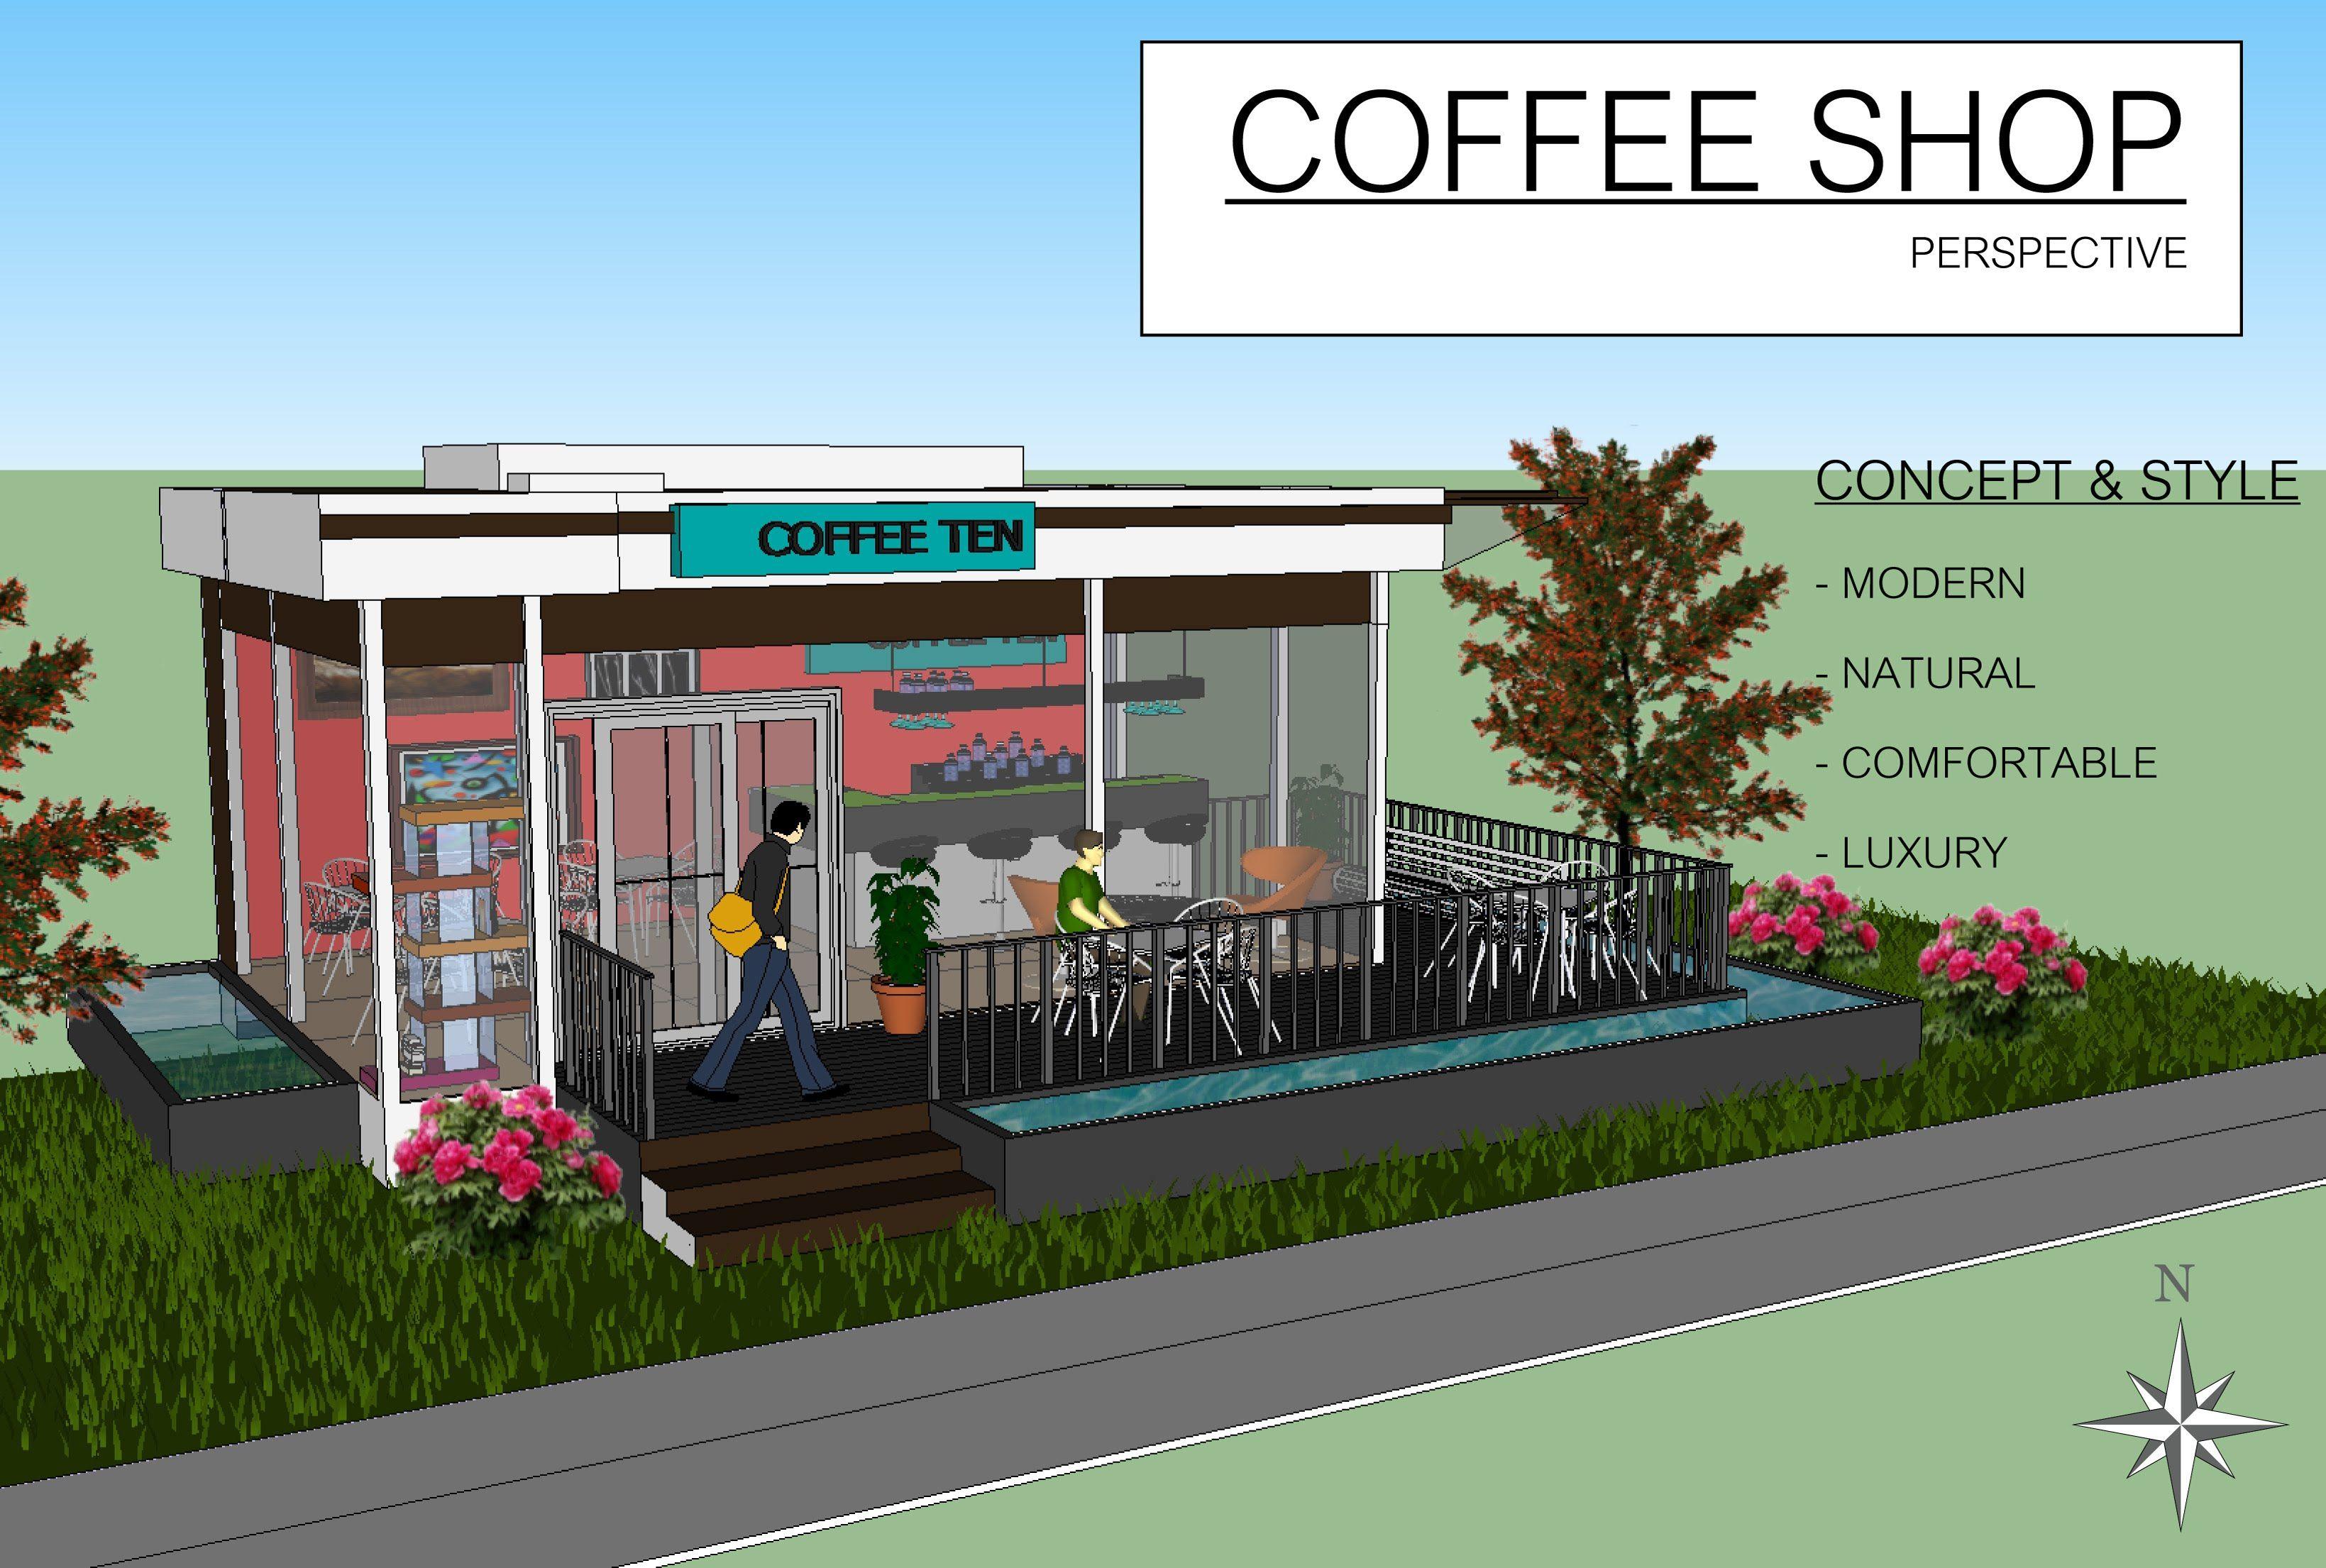 Small Coffee Shop design | Coffee Shop Design | Pinterest | Coffee ...